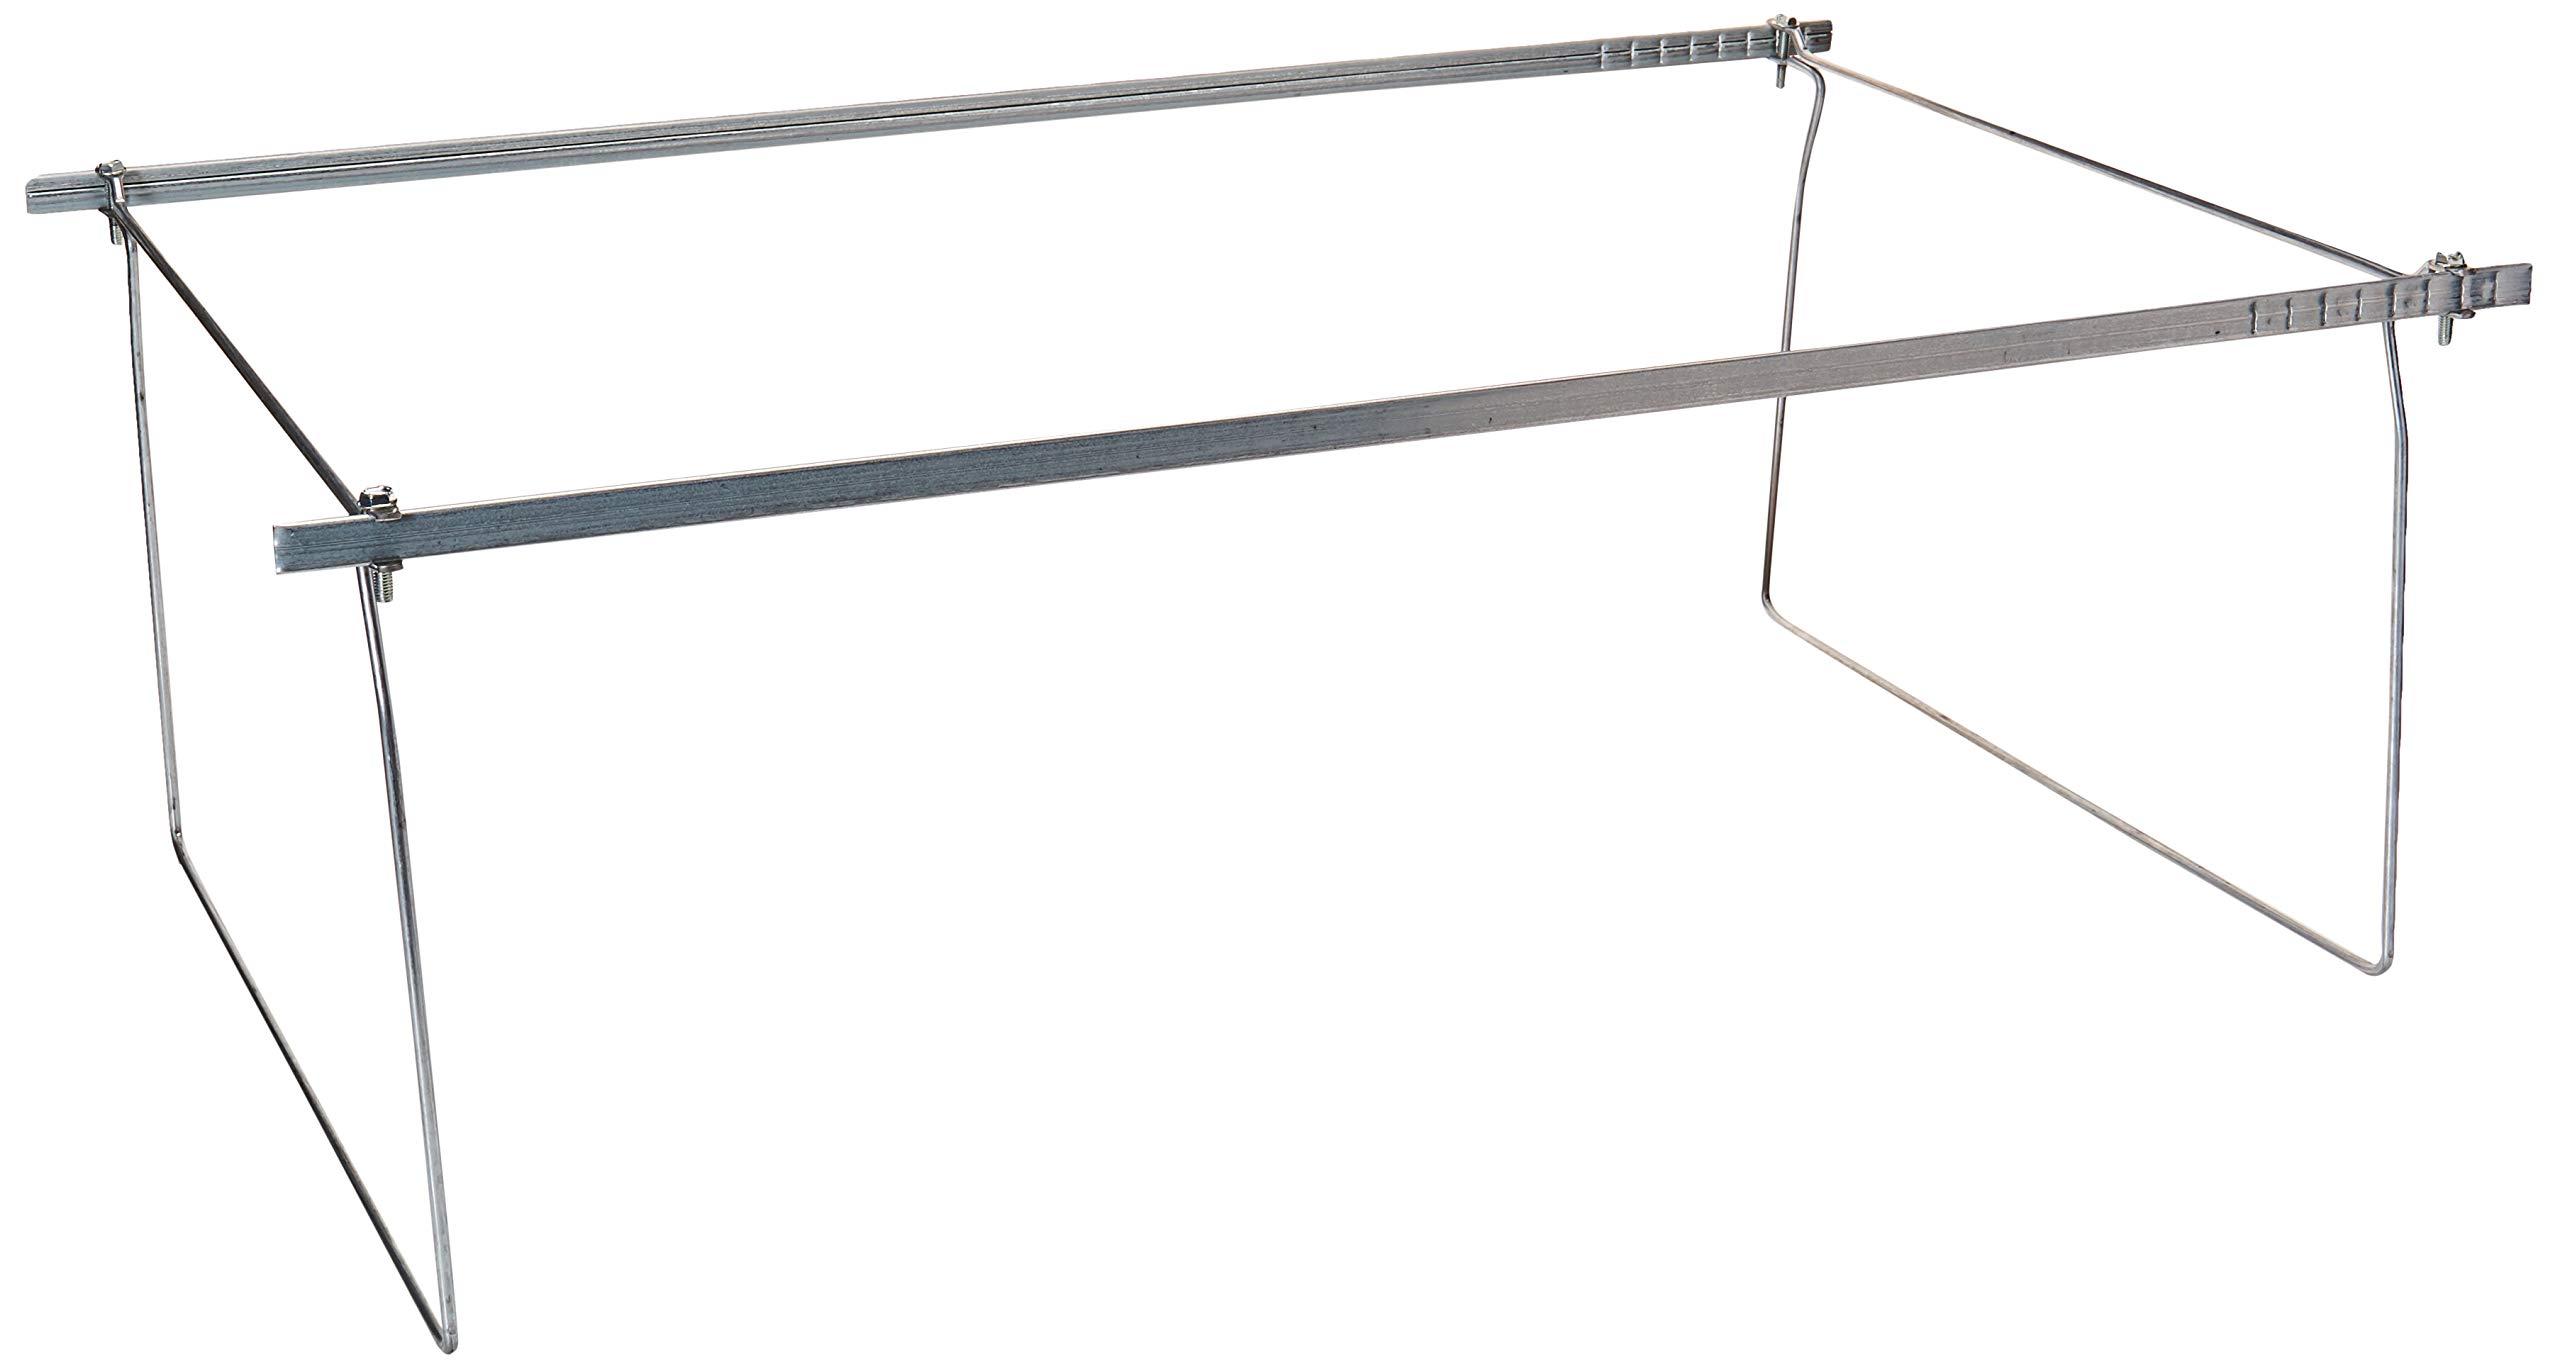 Smead Steel Hanging File Folder Frames, Legal Size, Steel, 2 per Pack (64873) by Smead